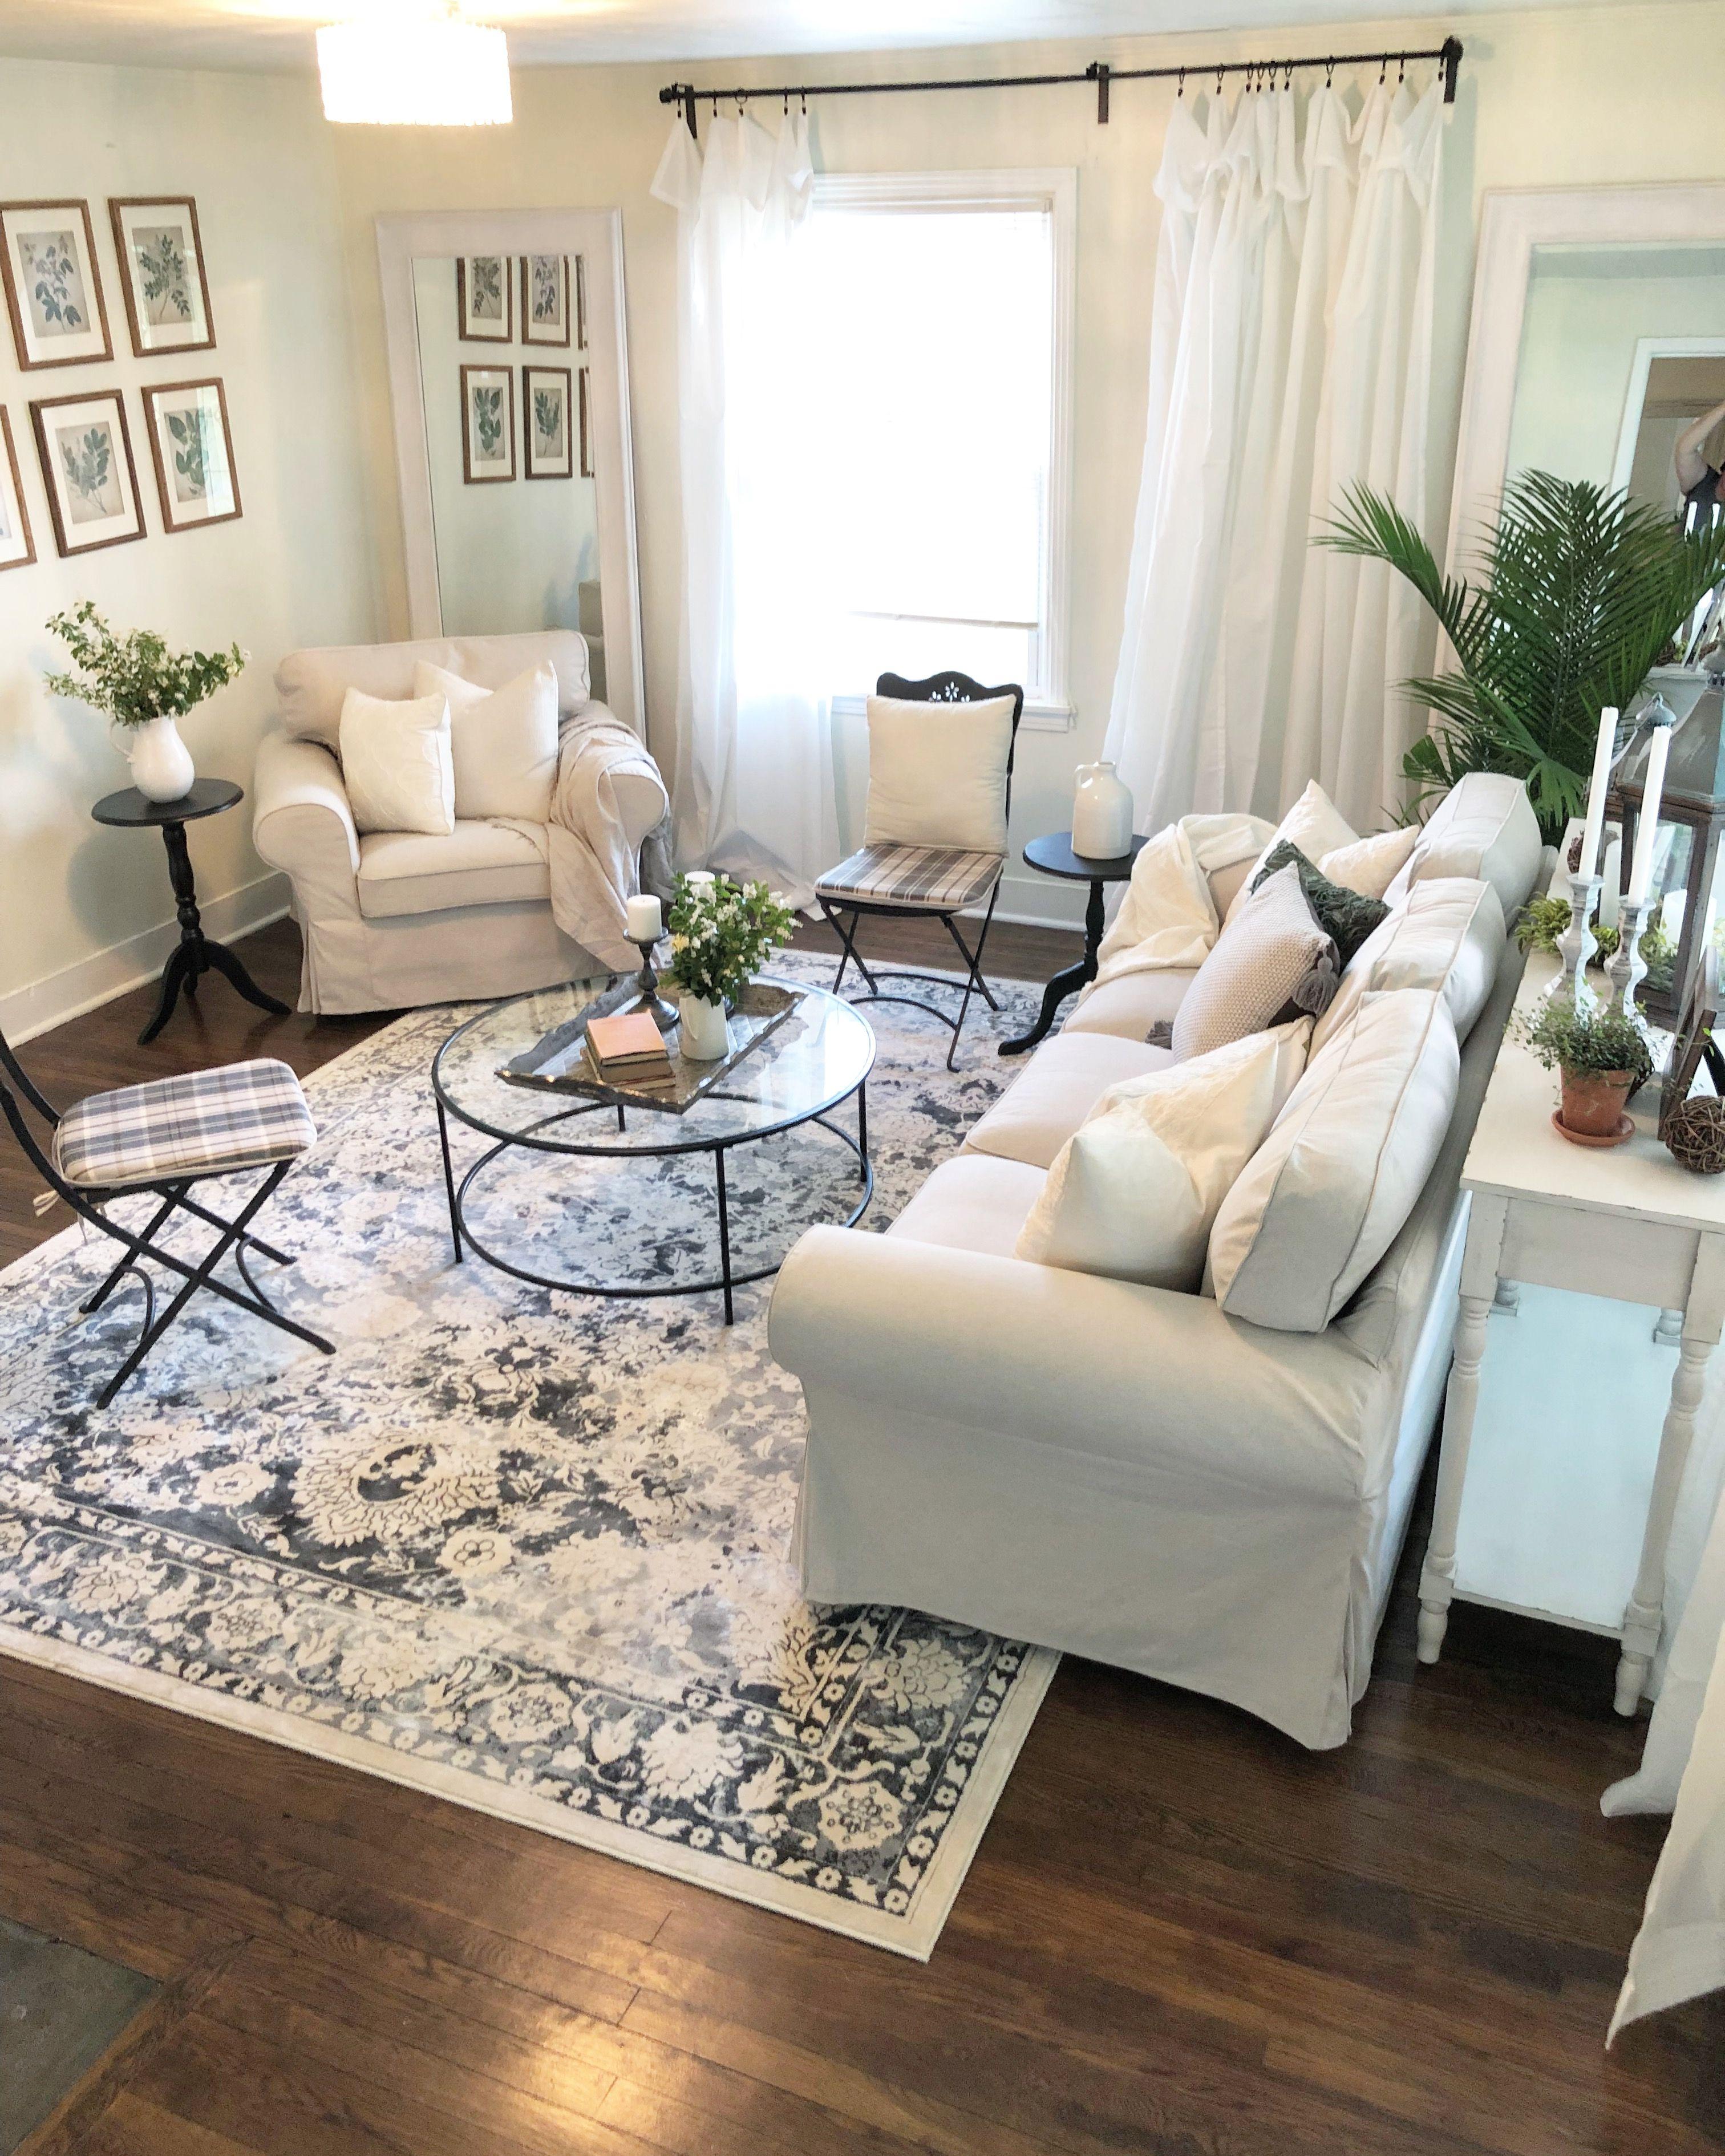 31+ Farmhouse living room set ideas in 2021